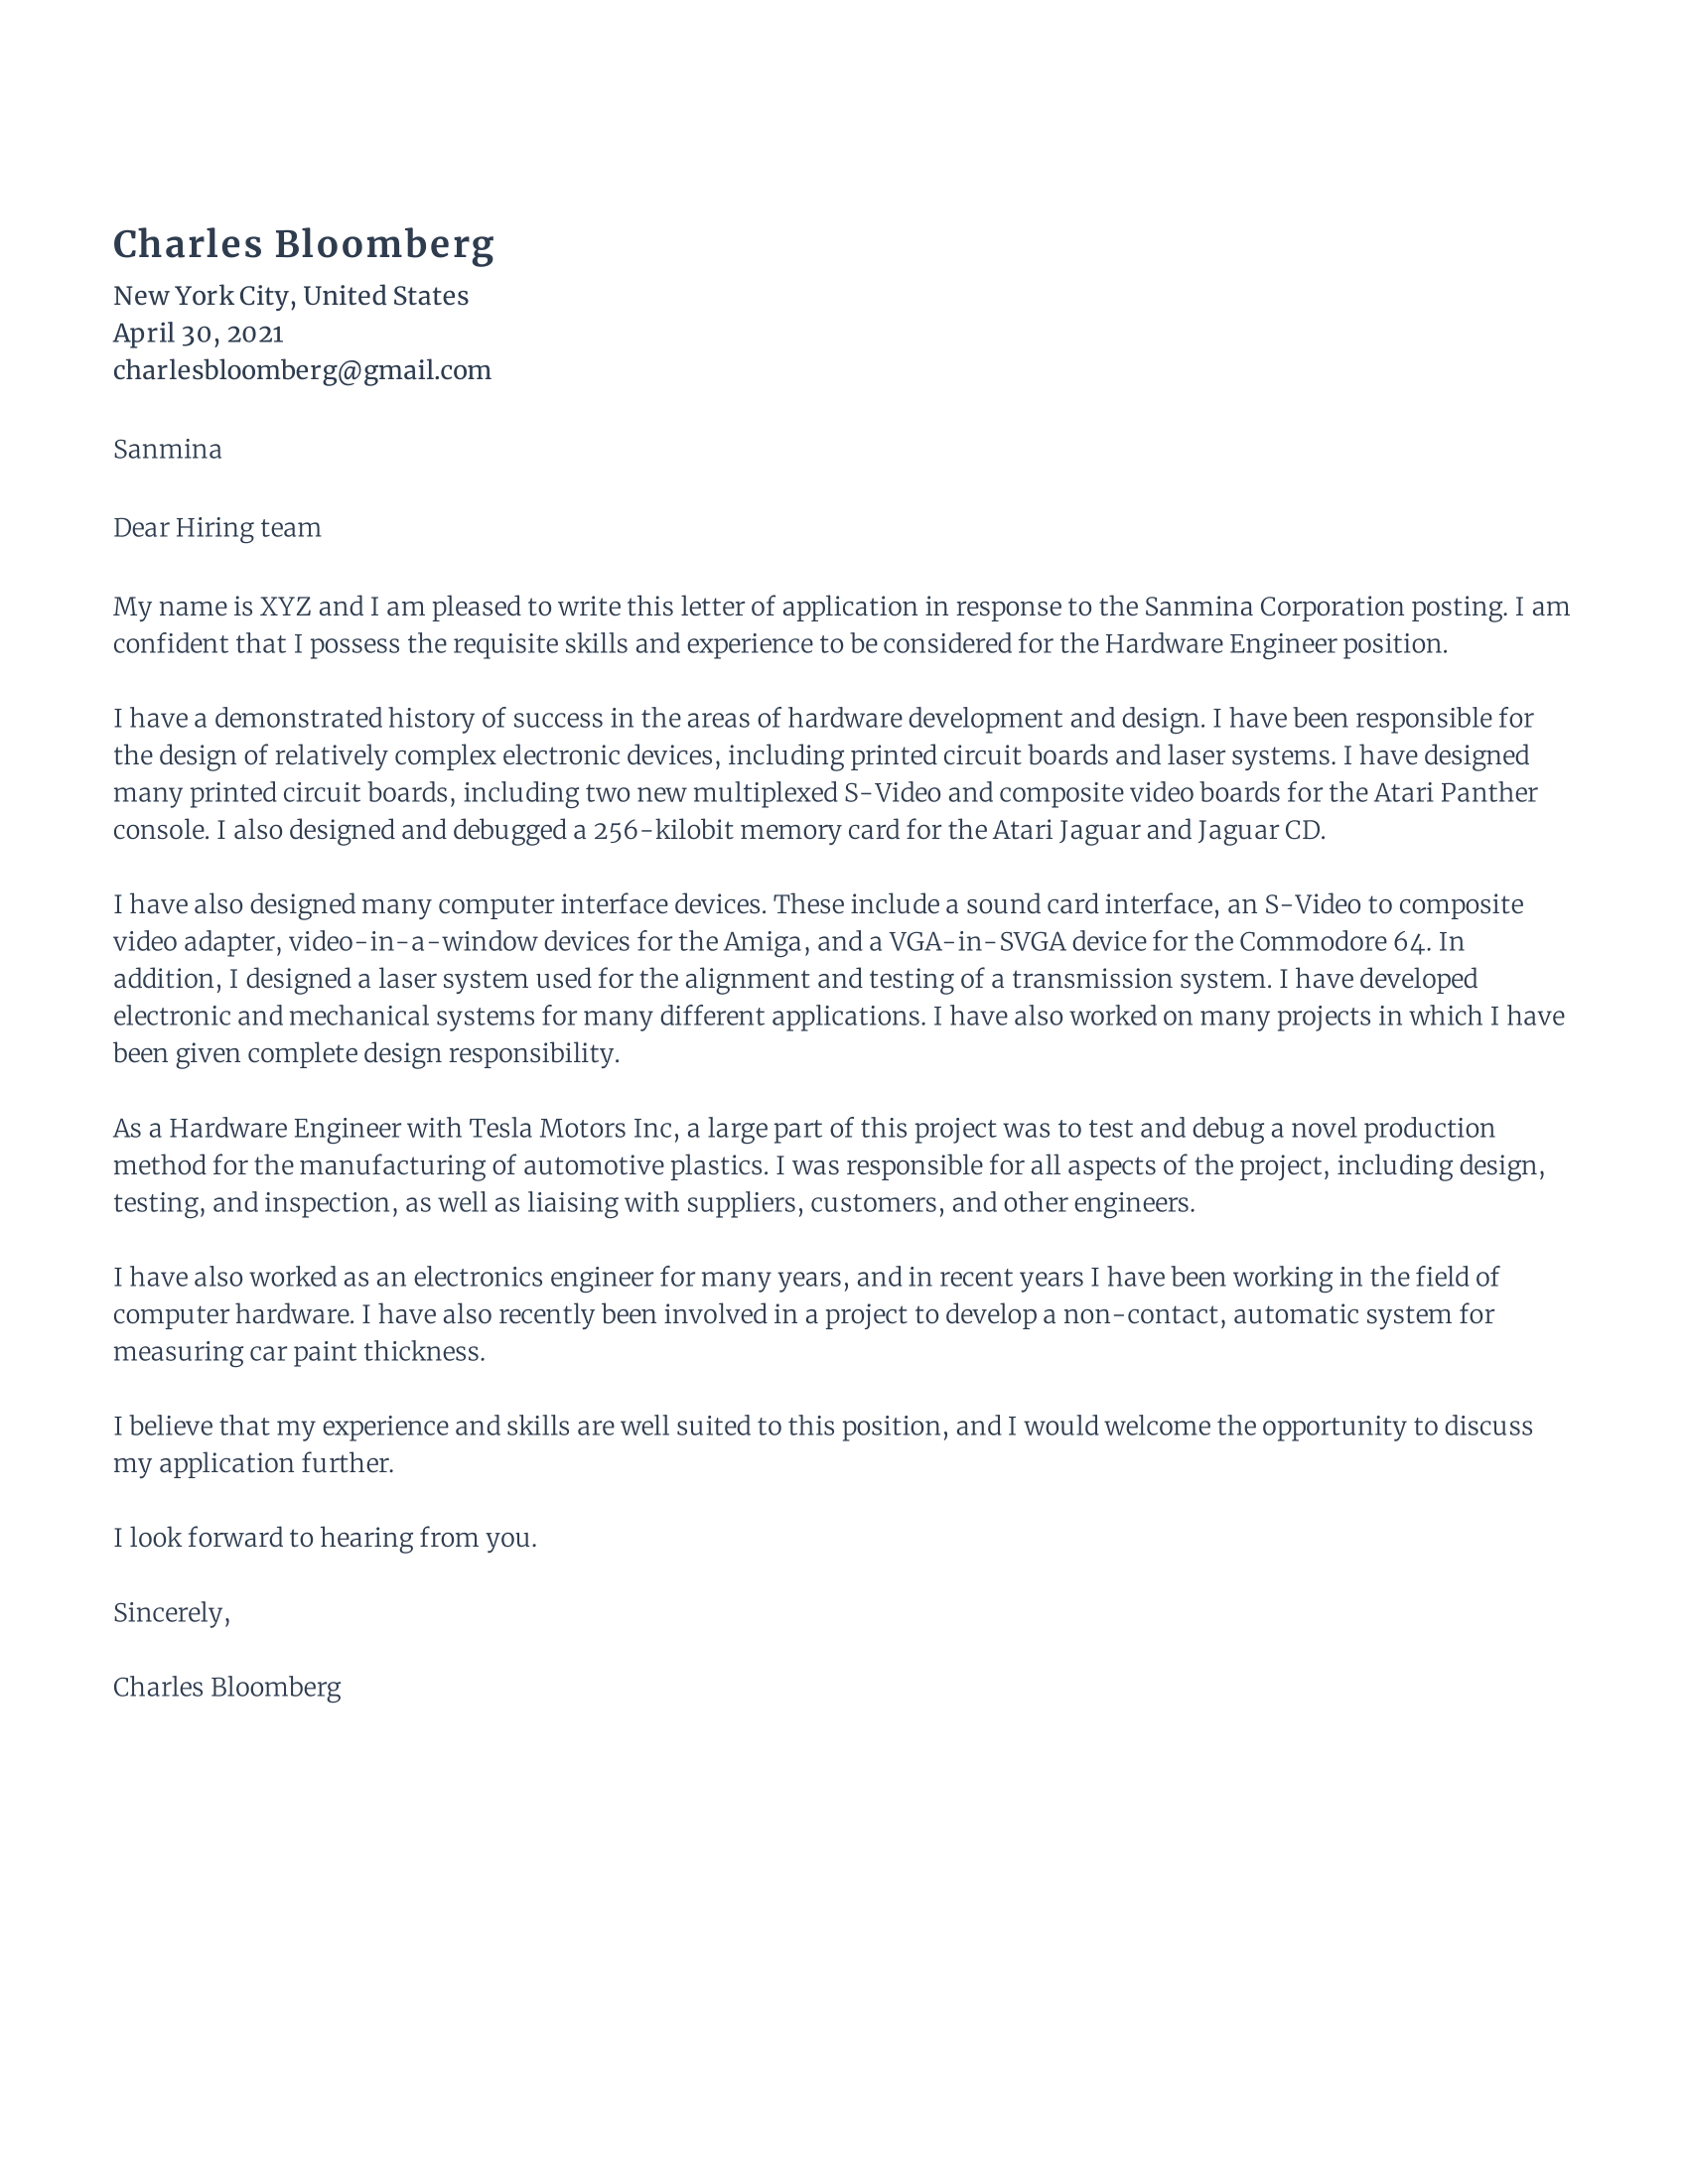 Cover Letter for Hardware engineer